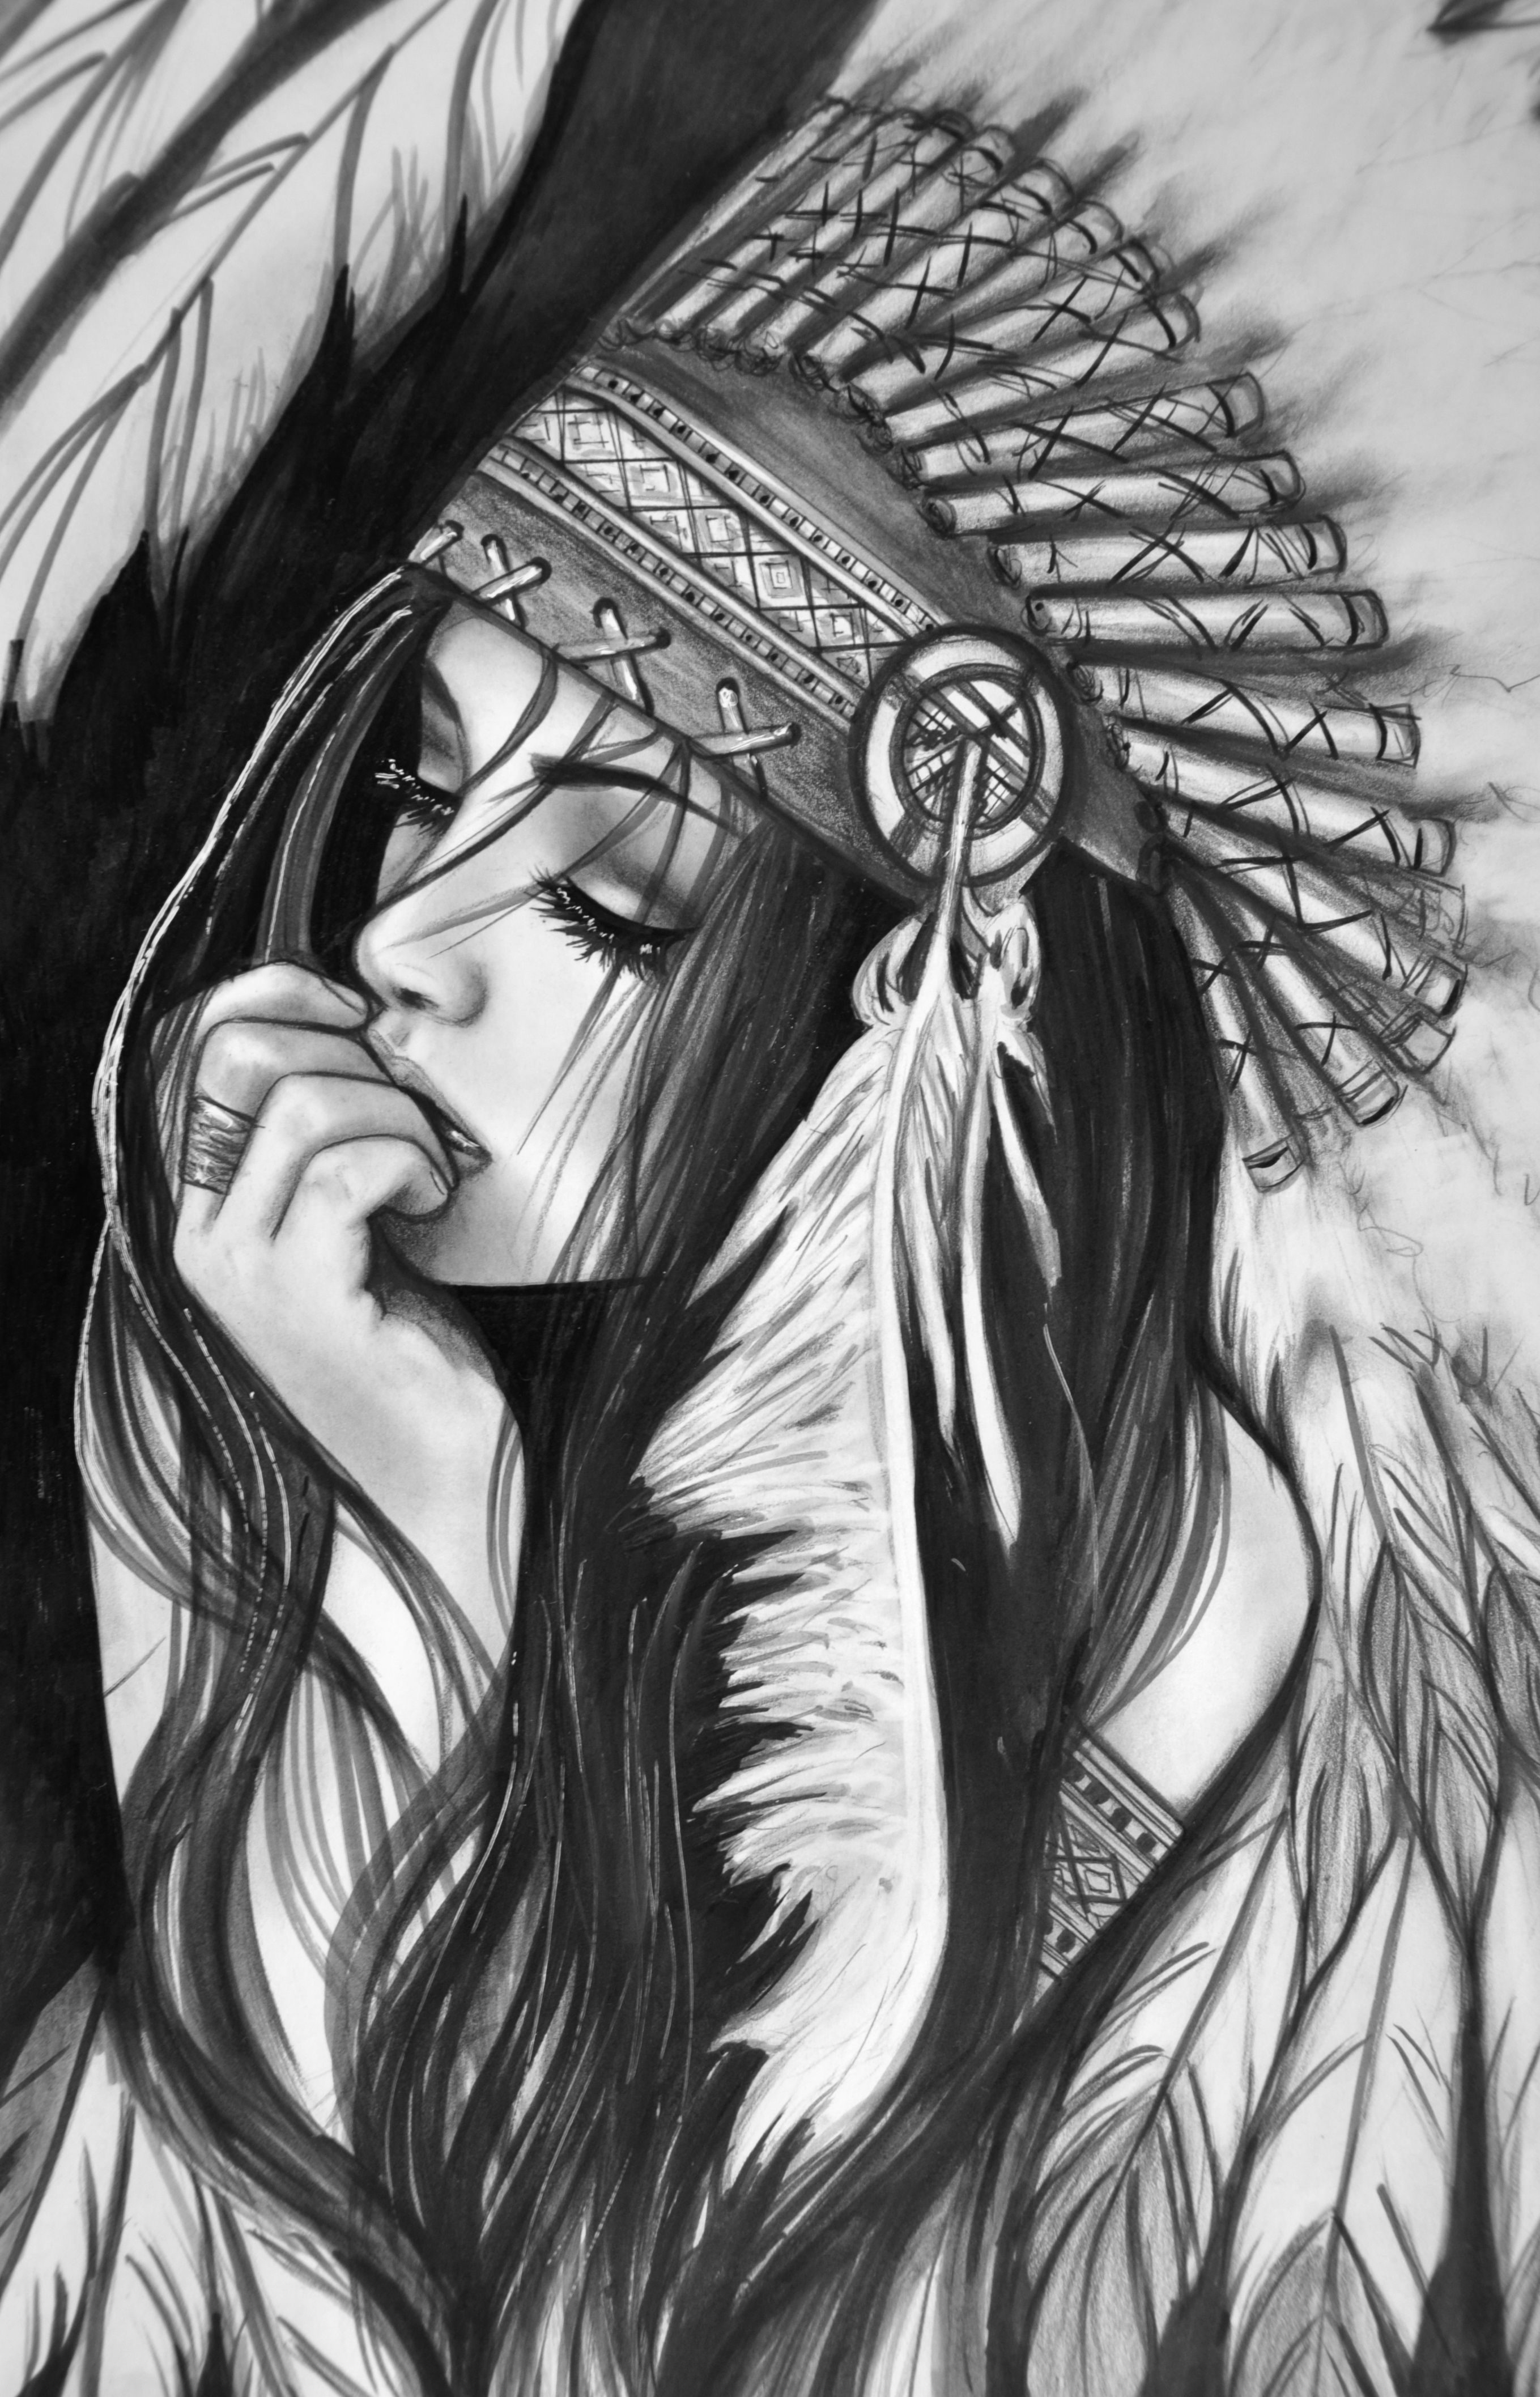 Pencil Drawing By Kristen Sorrenson